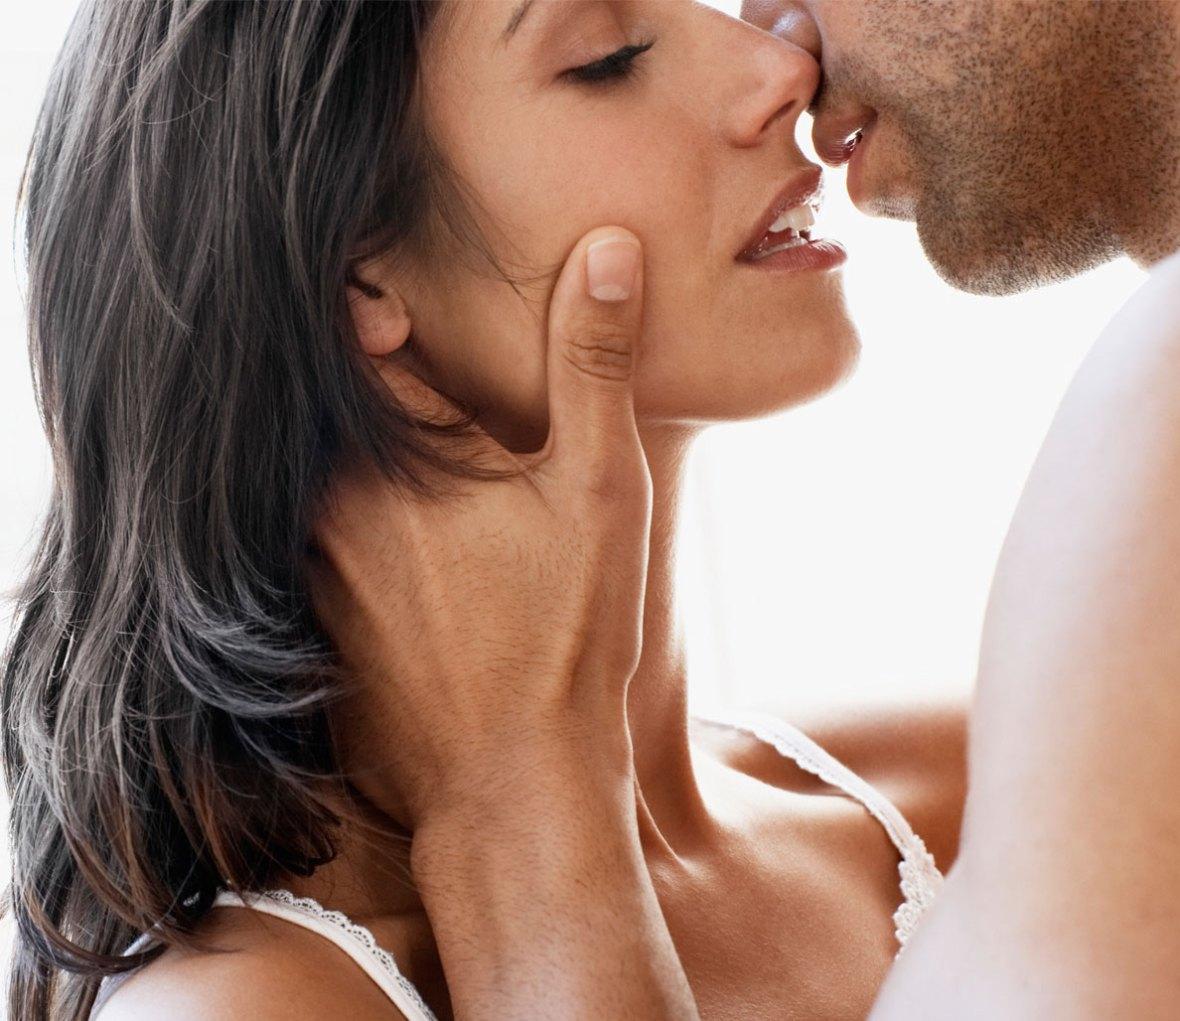 Lesbians Having Scissor Sex